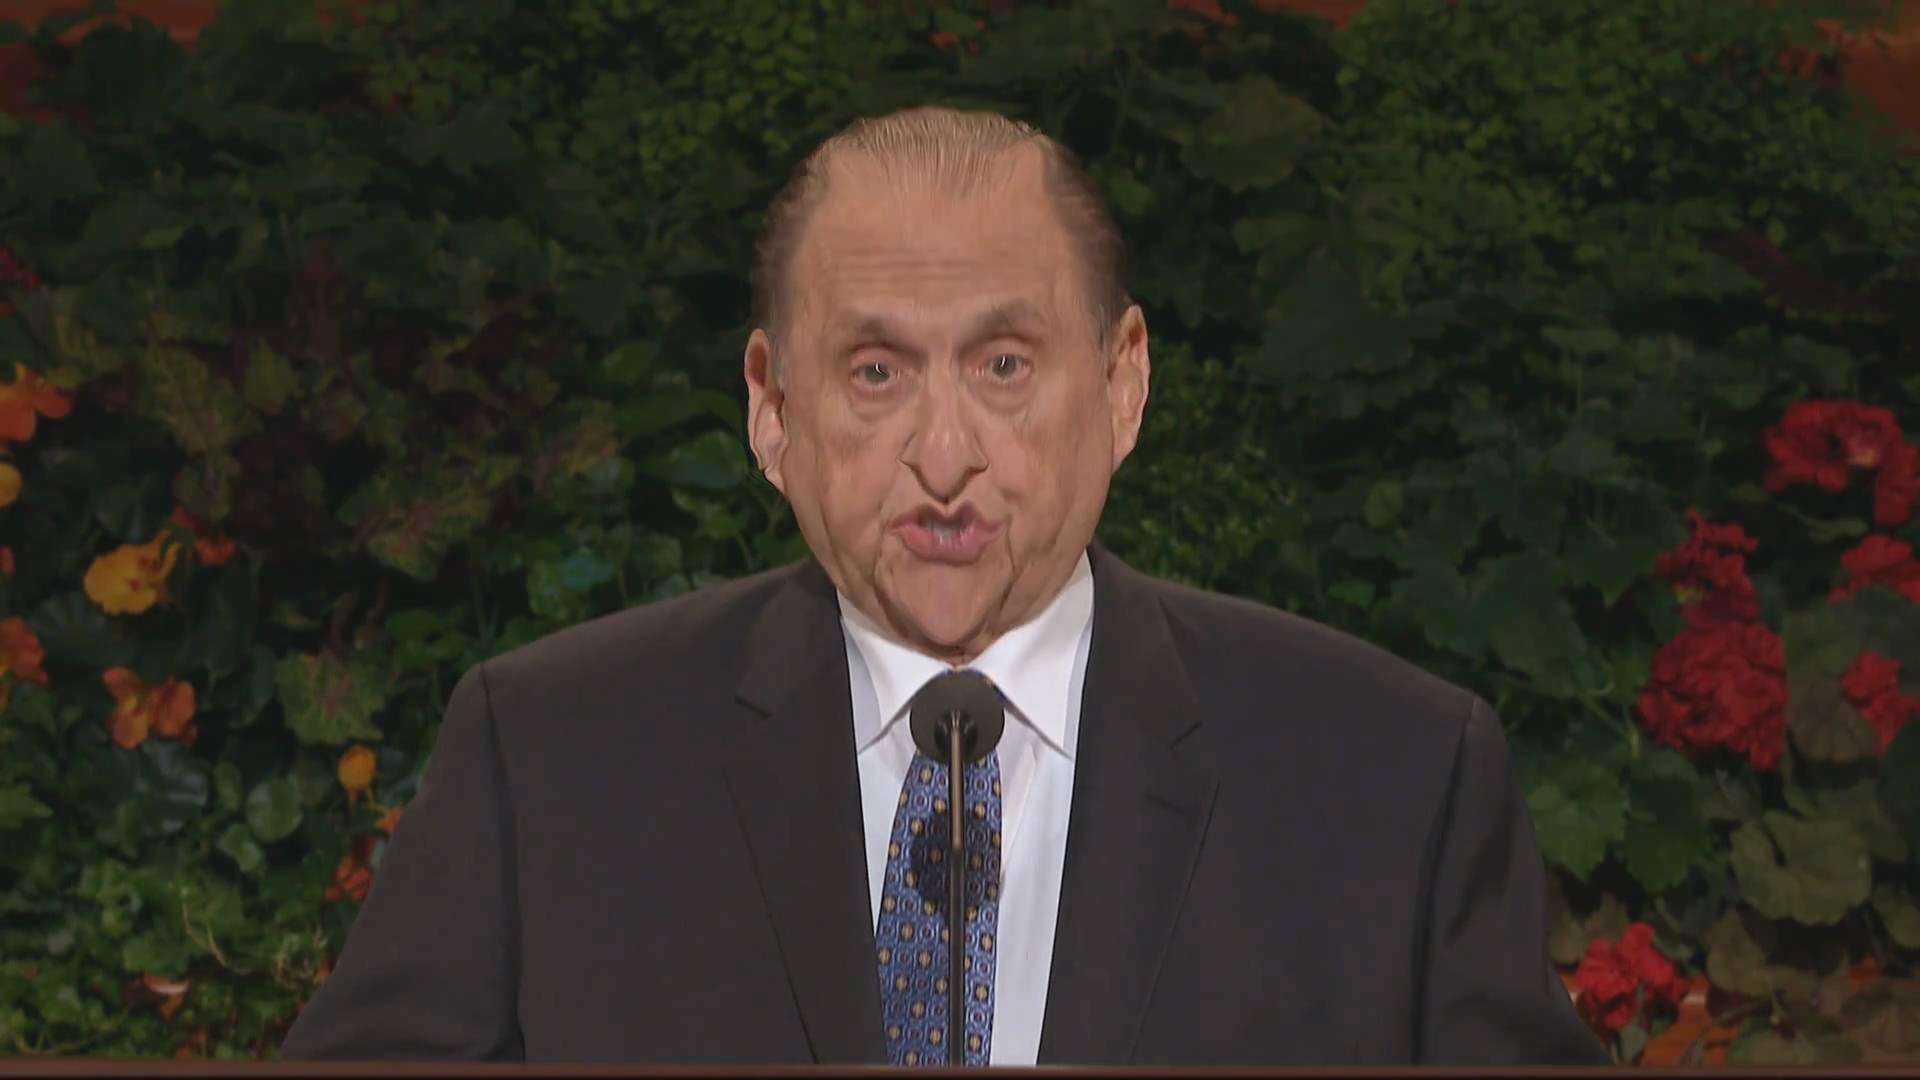 Mormons allow gays